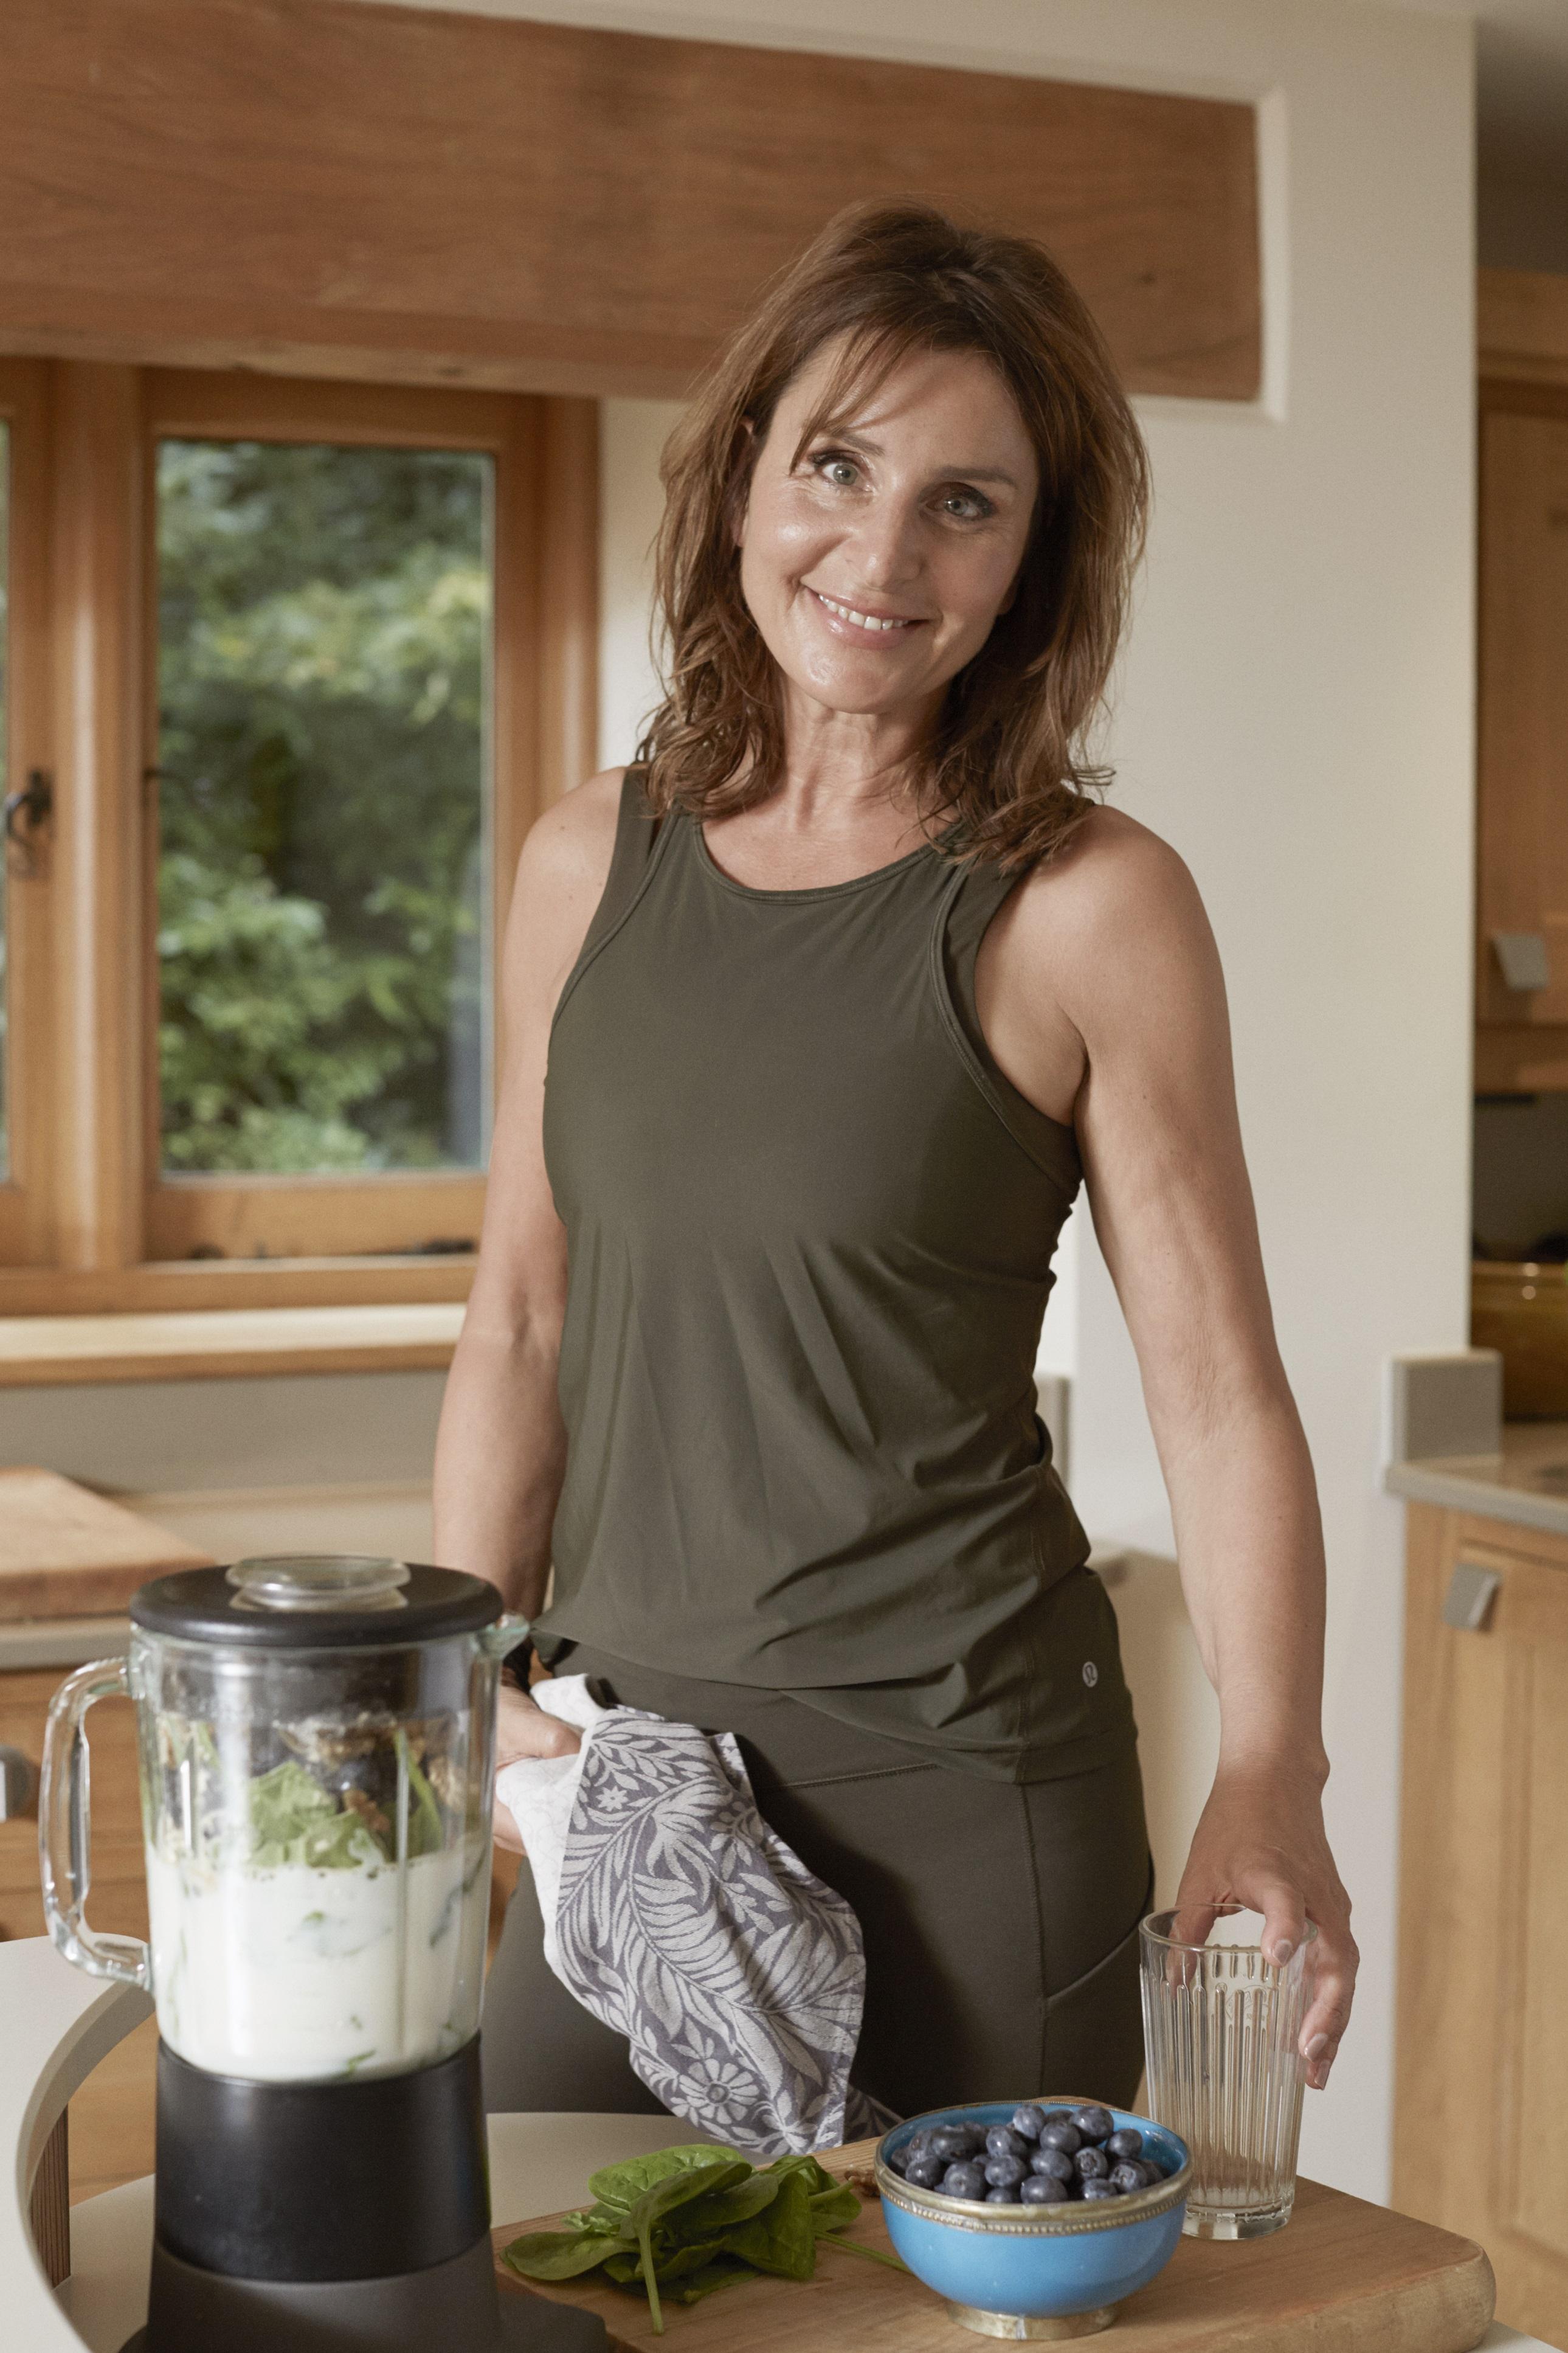 Maria Borelius, sundhed, health, smoothie, anti-inflammatorisk, mad, bøger, bog, books